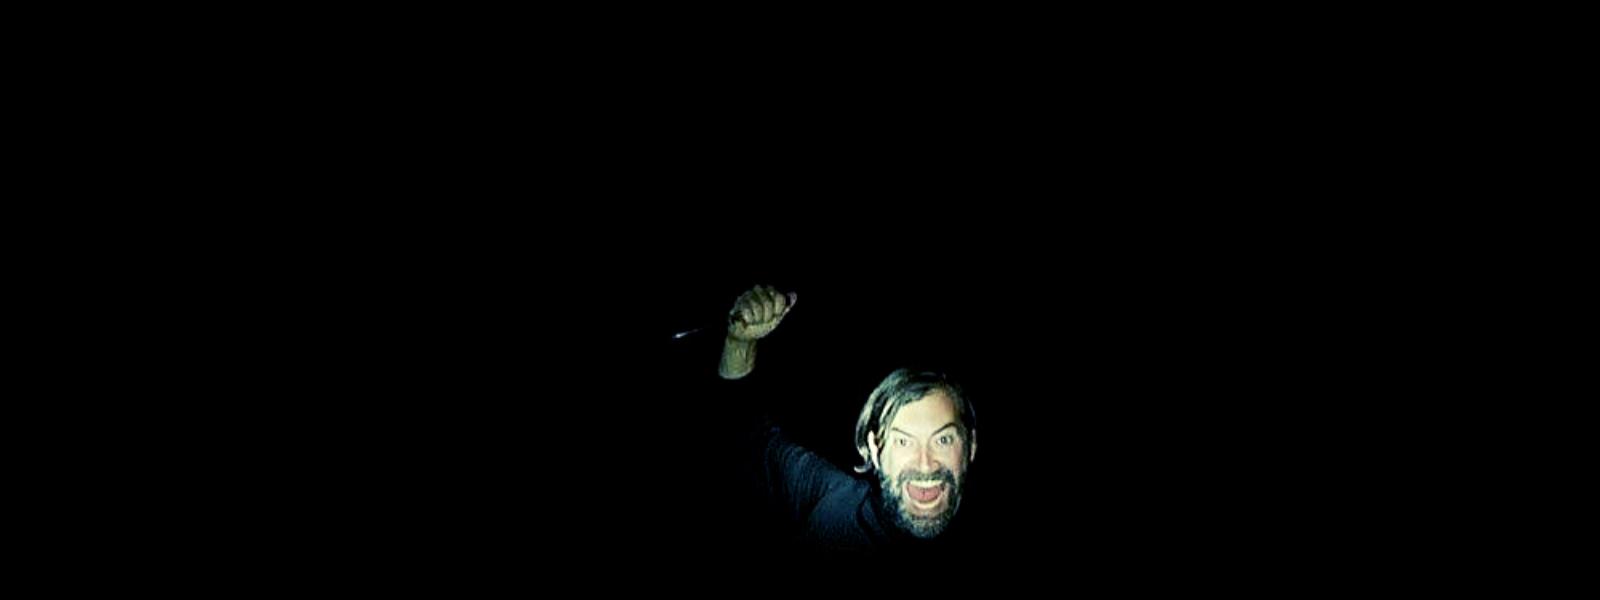 Mark Duplass scary still from creep 2 (2017)